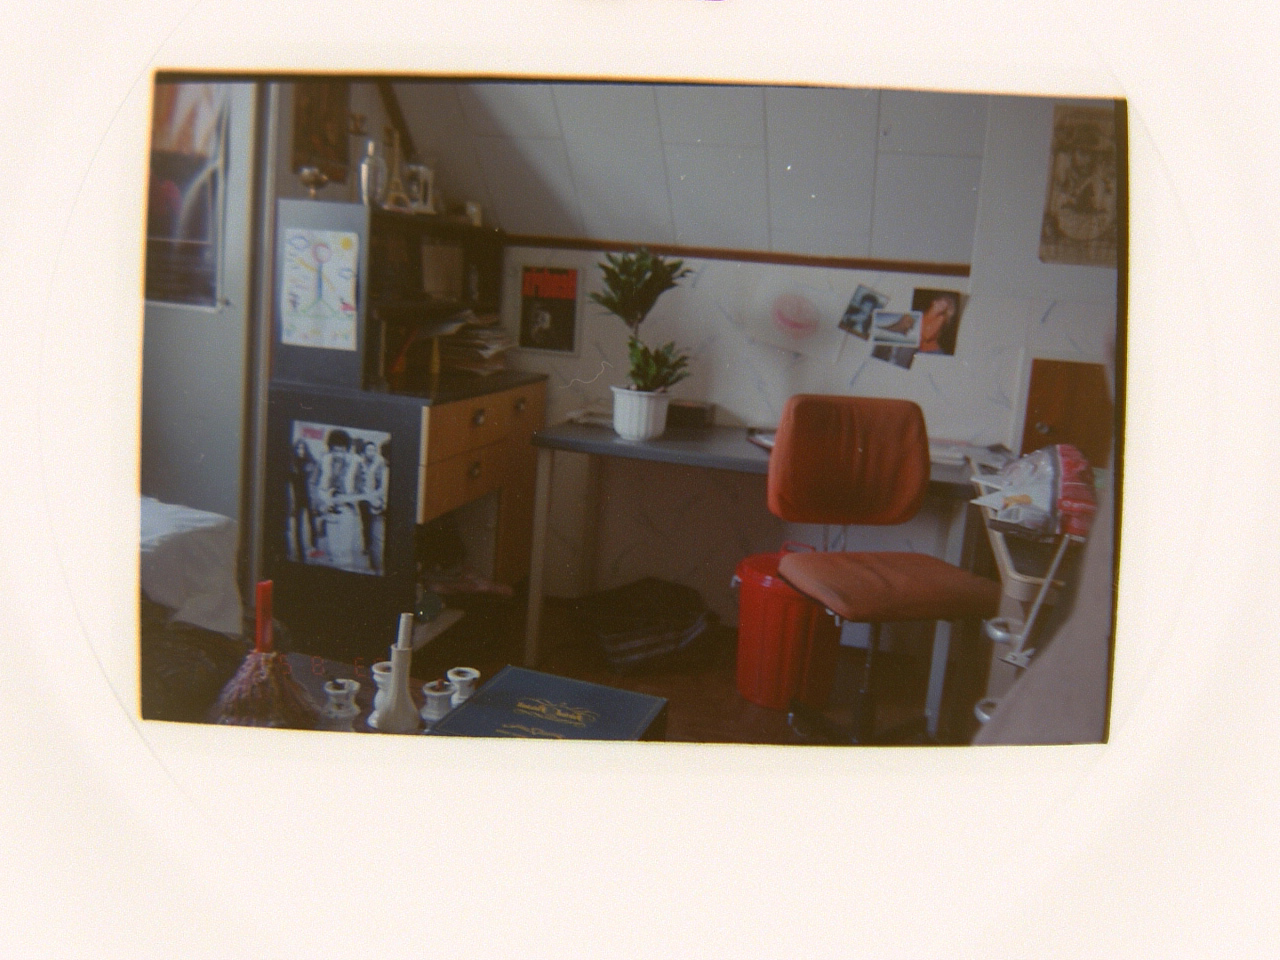 maartent bed room orange chair posters drawings photos desk